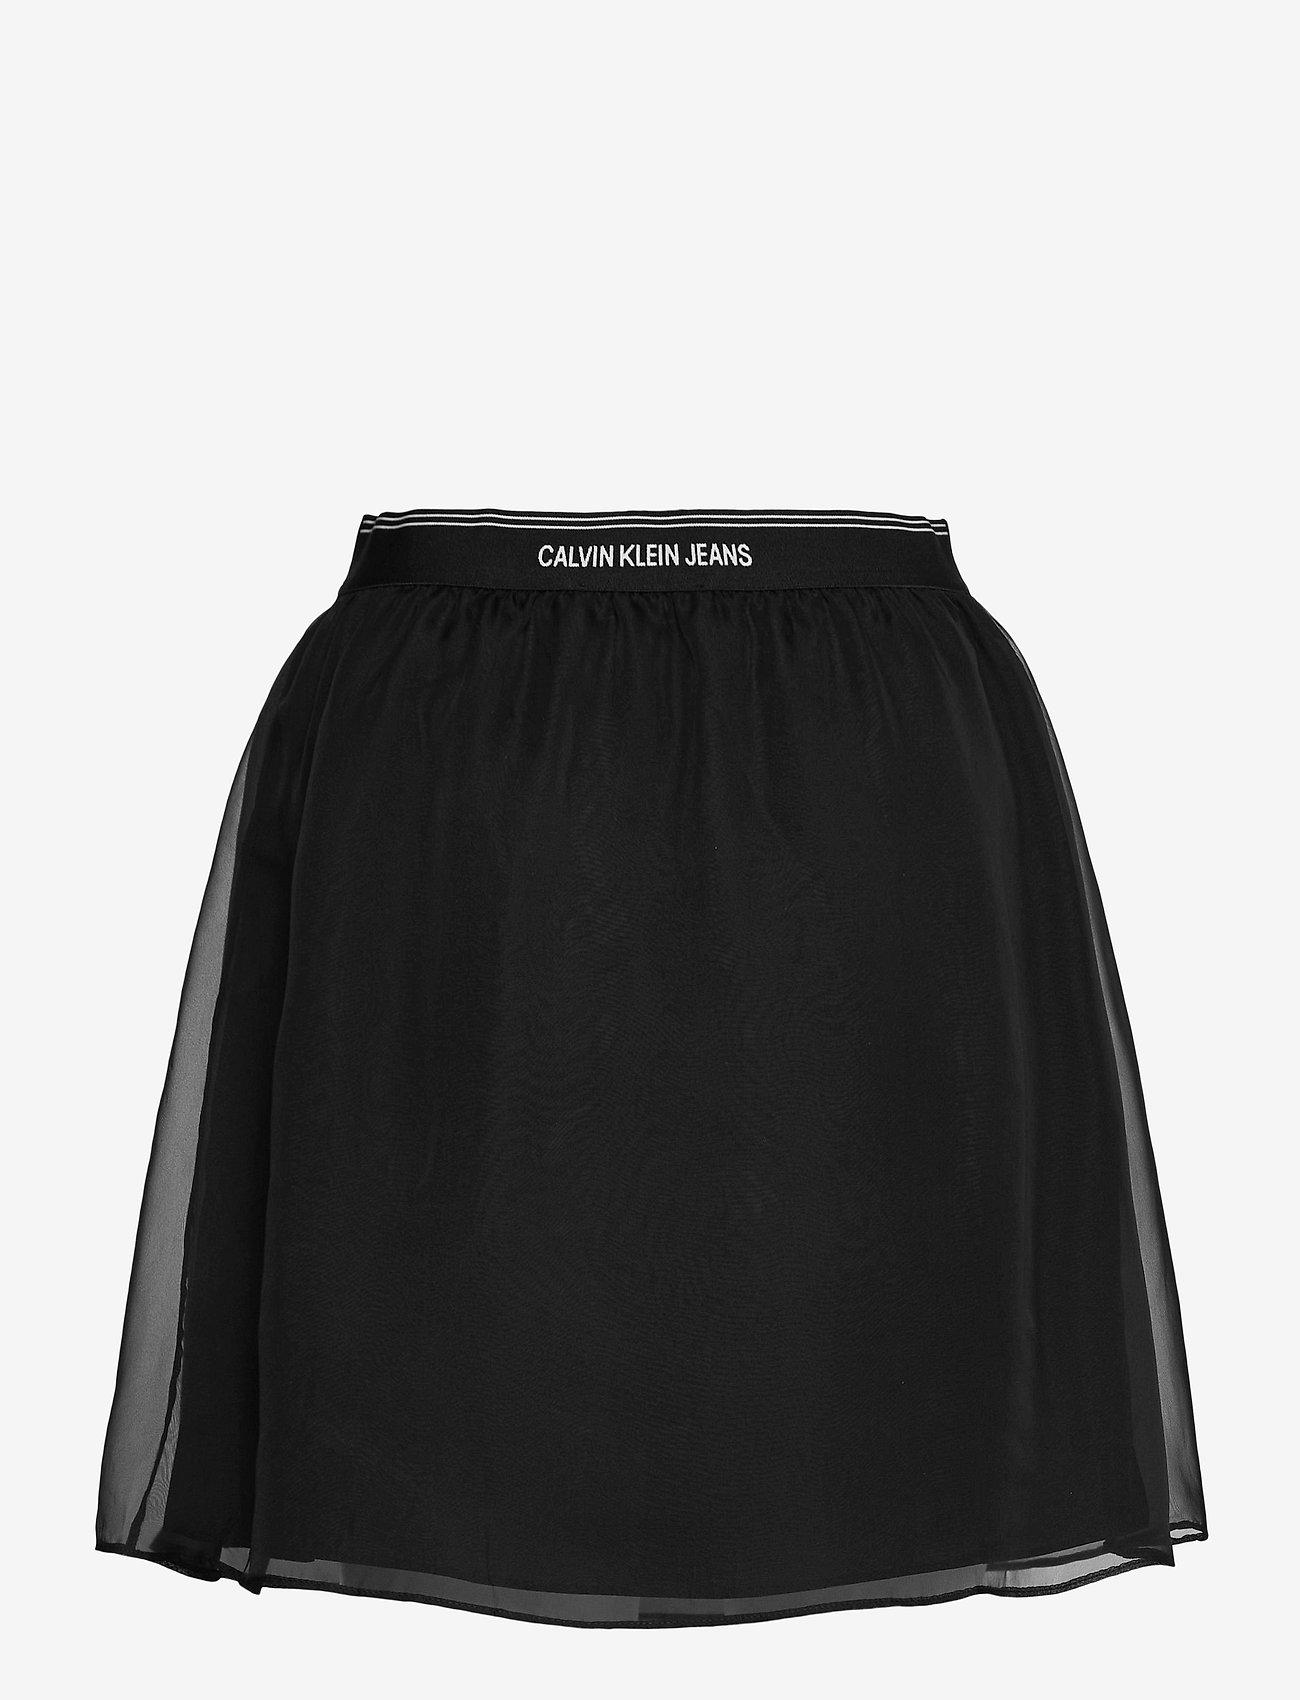 Calvin Klein Jeans - LOGO WAISTBAND CHIFFON SKIRT - korta kjolar - ck black - 1